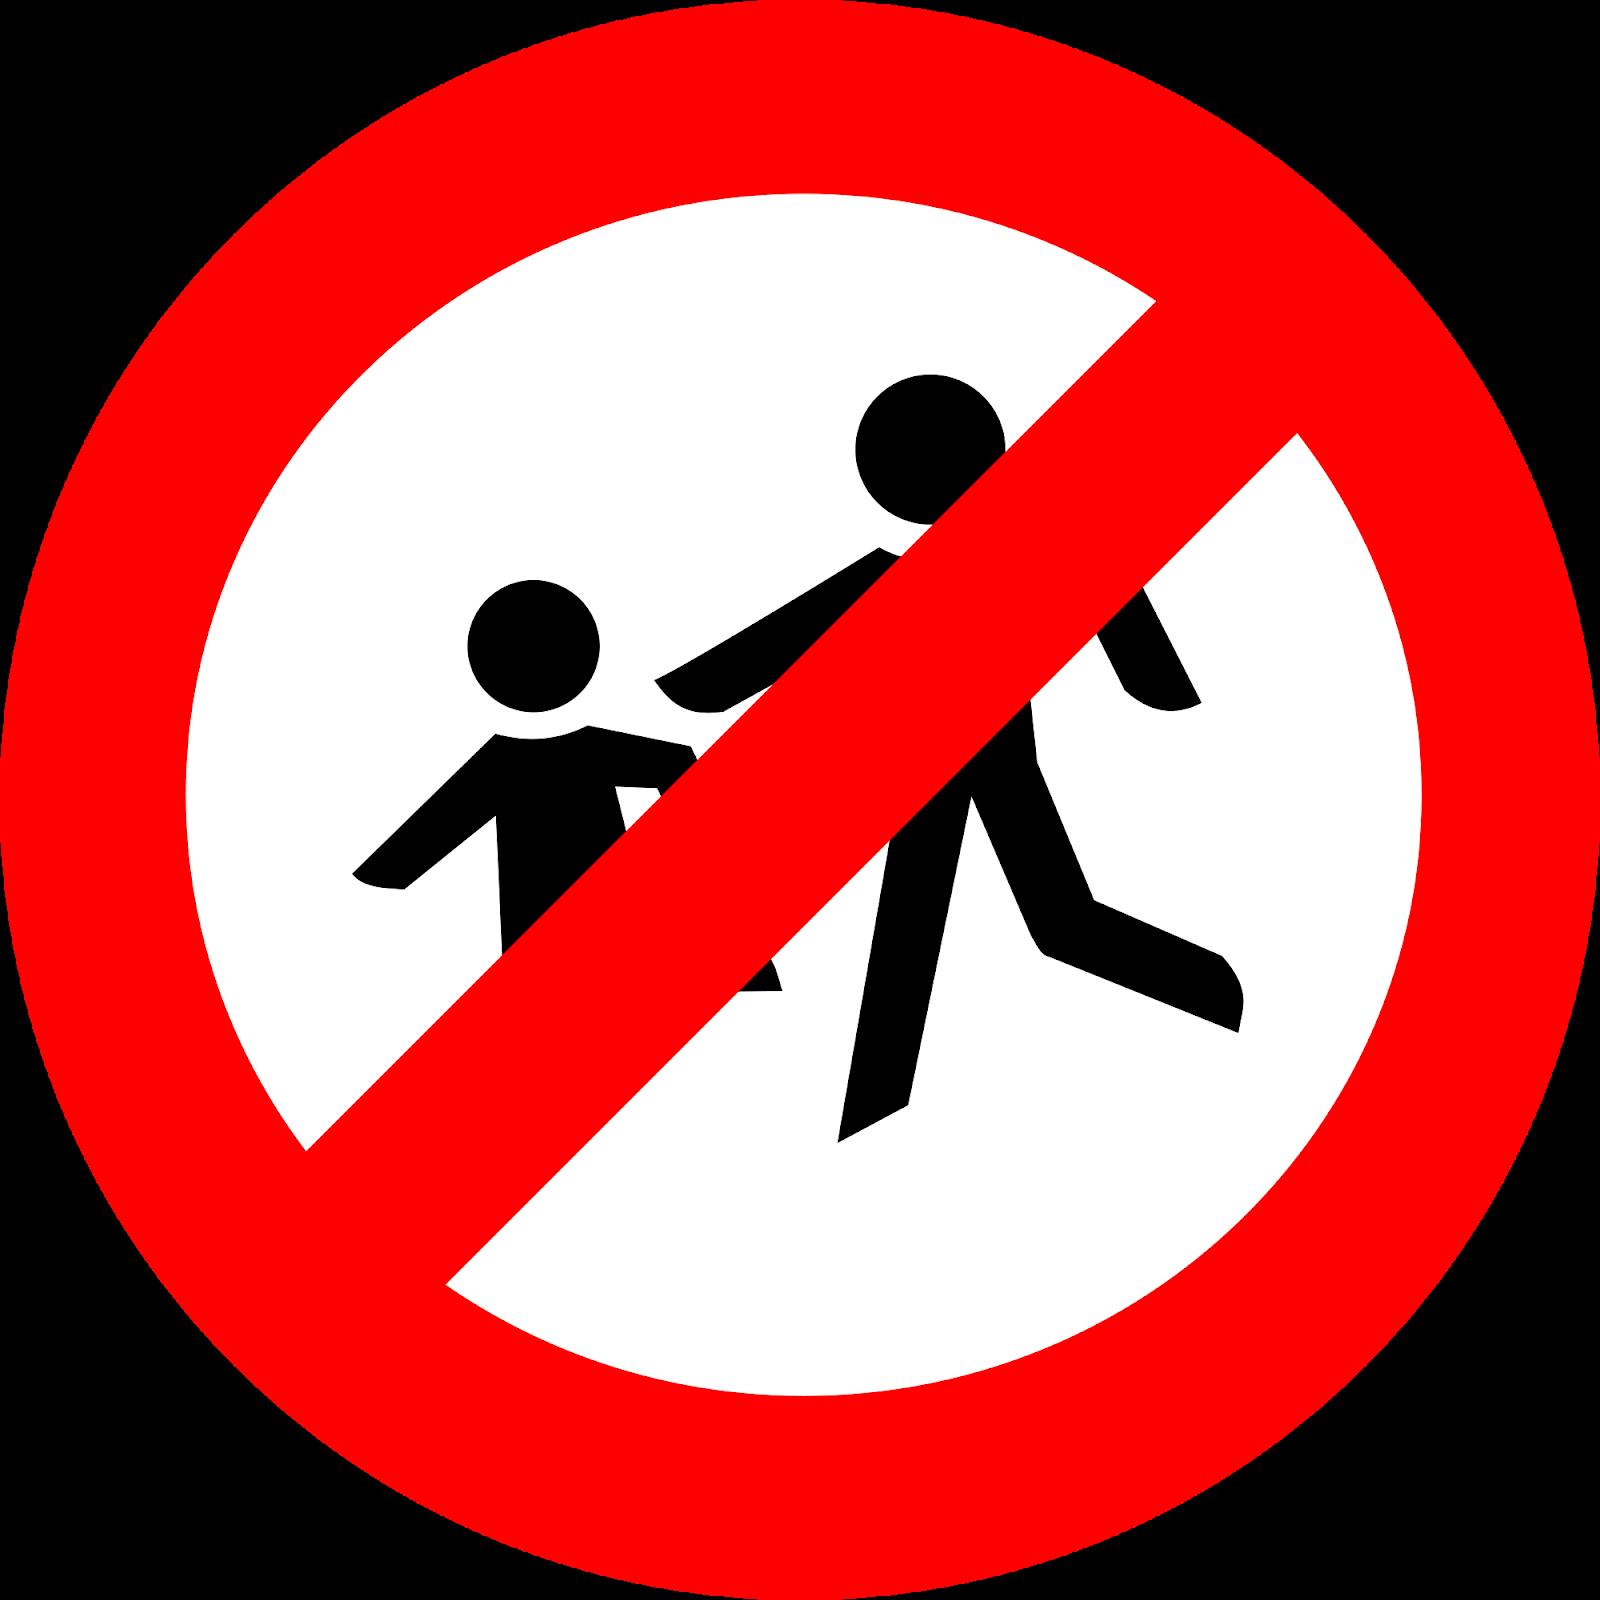 https://upload.wikimedia.org/wikipedia/commons/thumb/f/ff/Zeichen_no_children.svg/2000px-Zeichen_no_children.svg.png